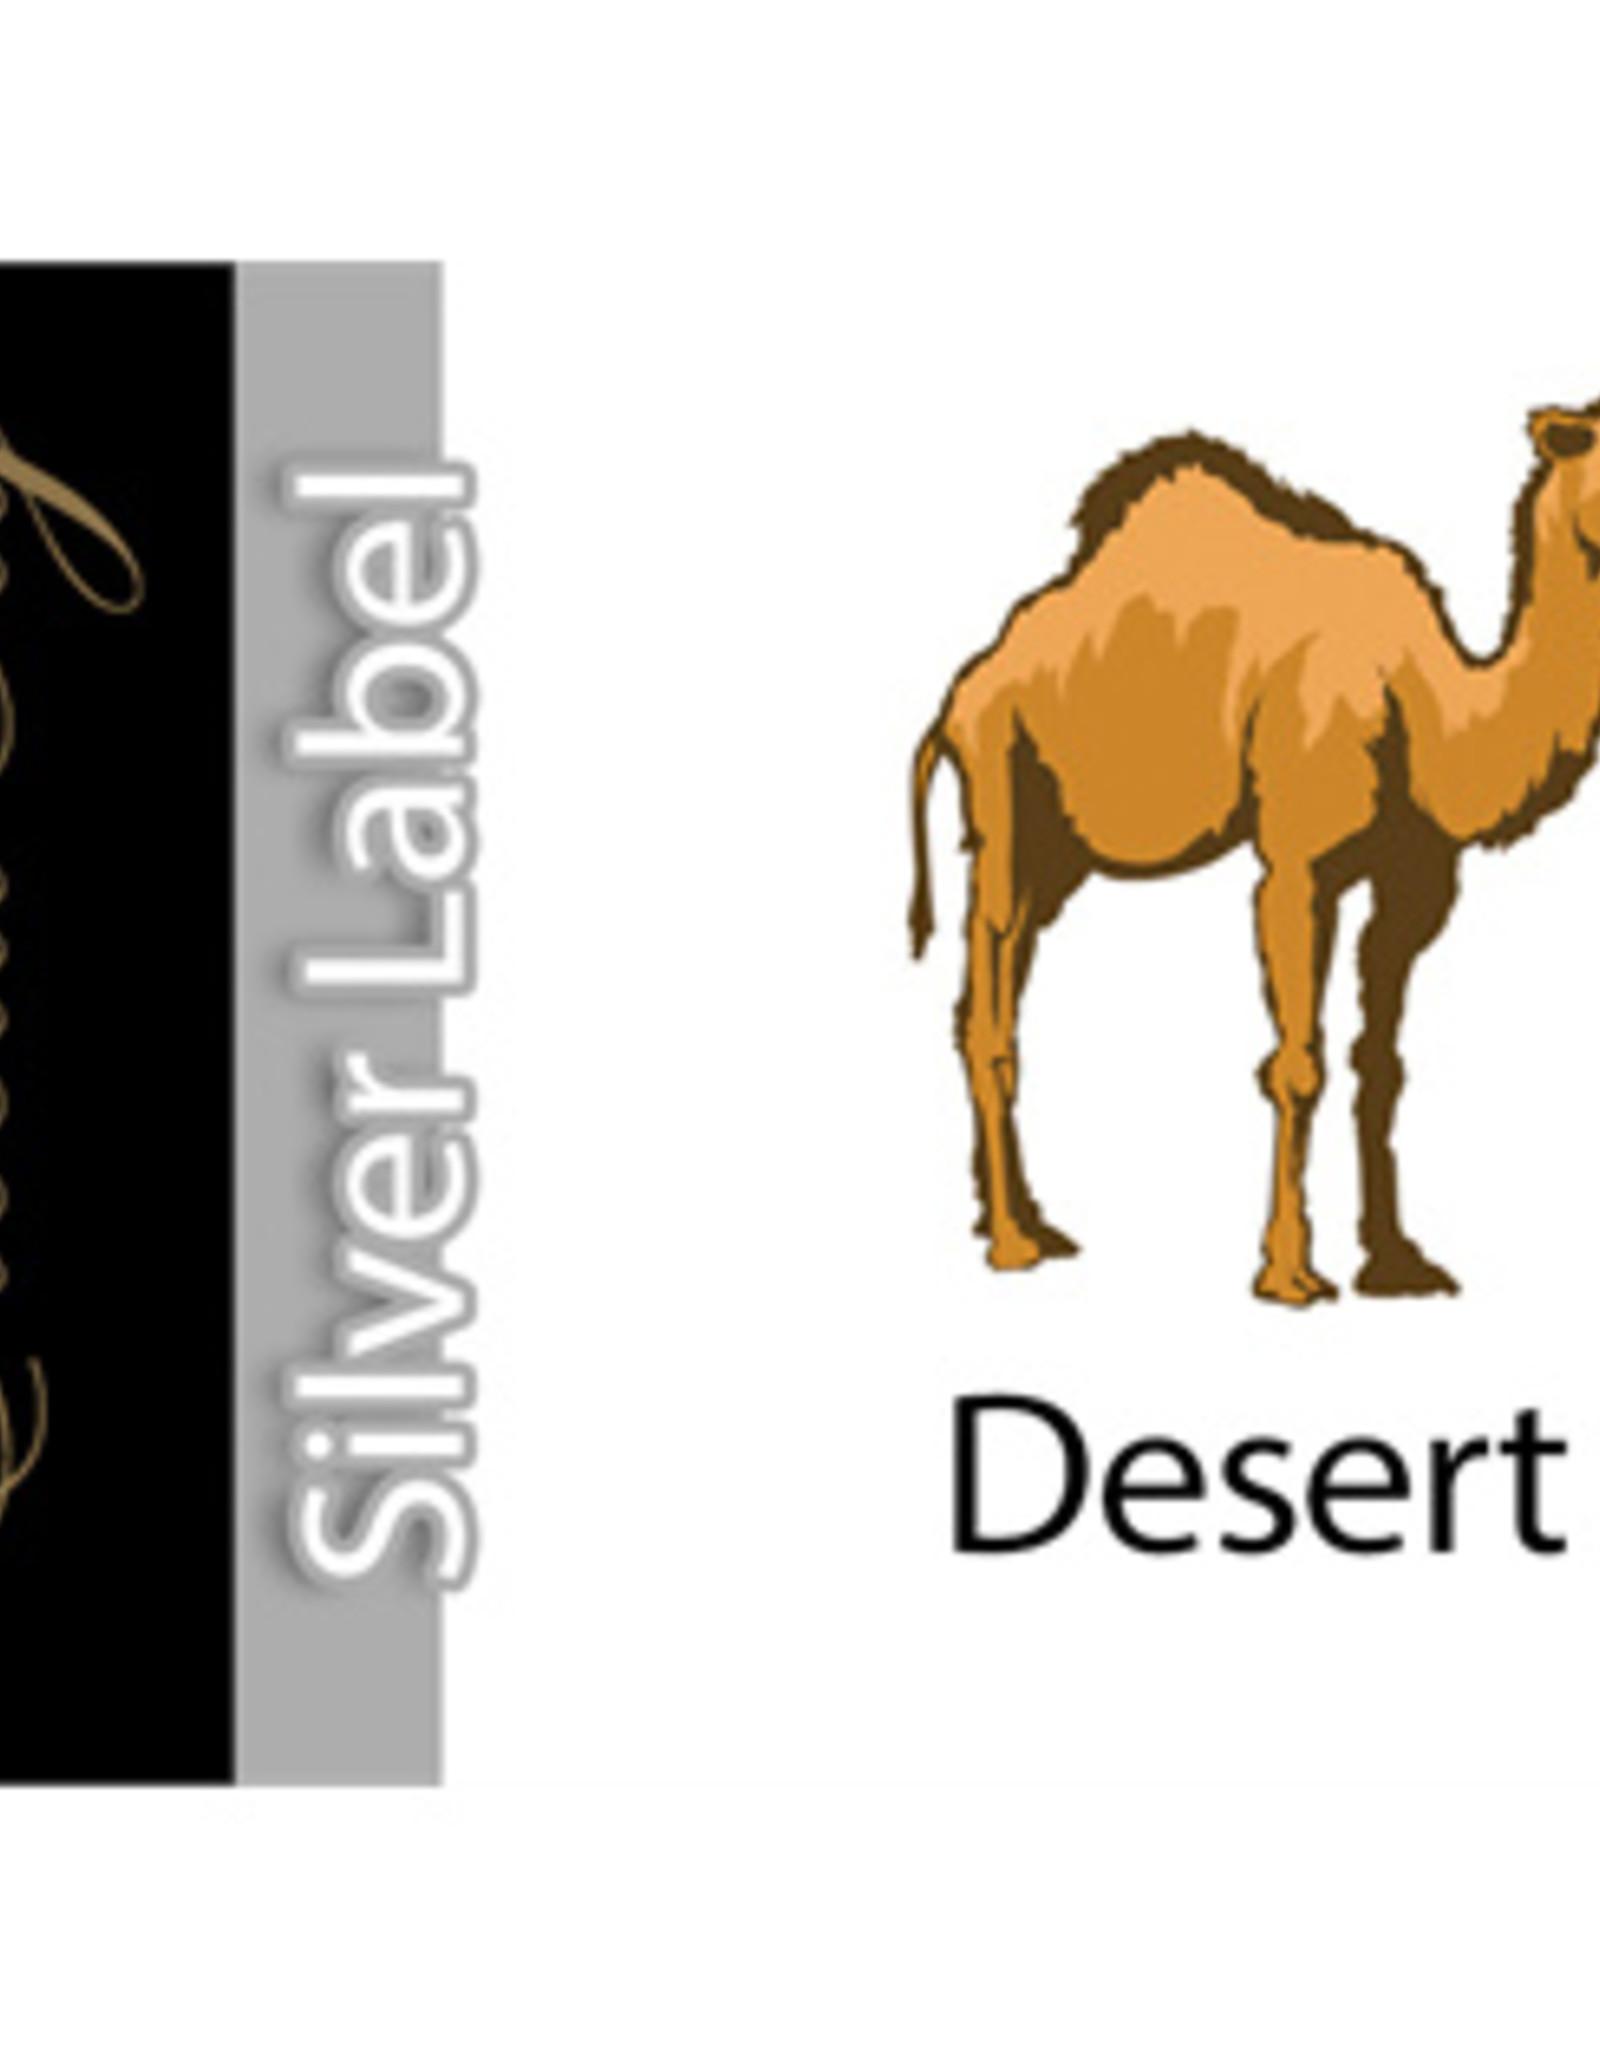 Exclucig Exclucig Silver Label E-liquid Desert 6 mg Nicotine